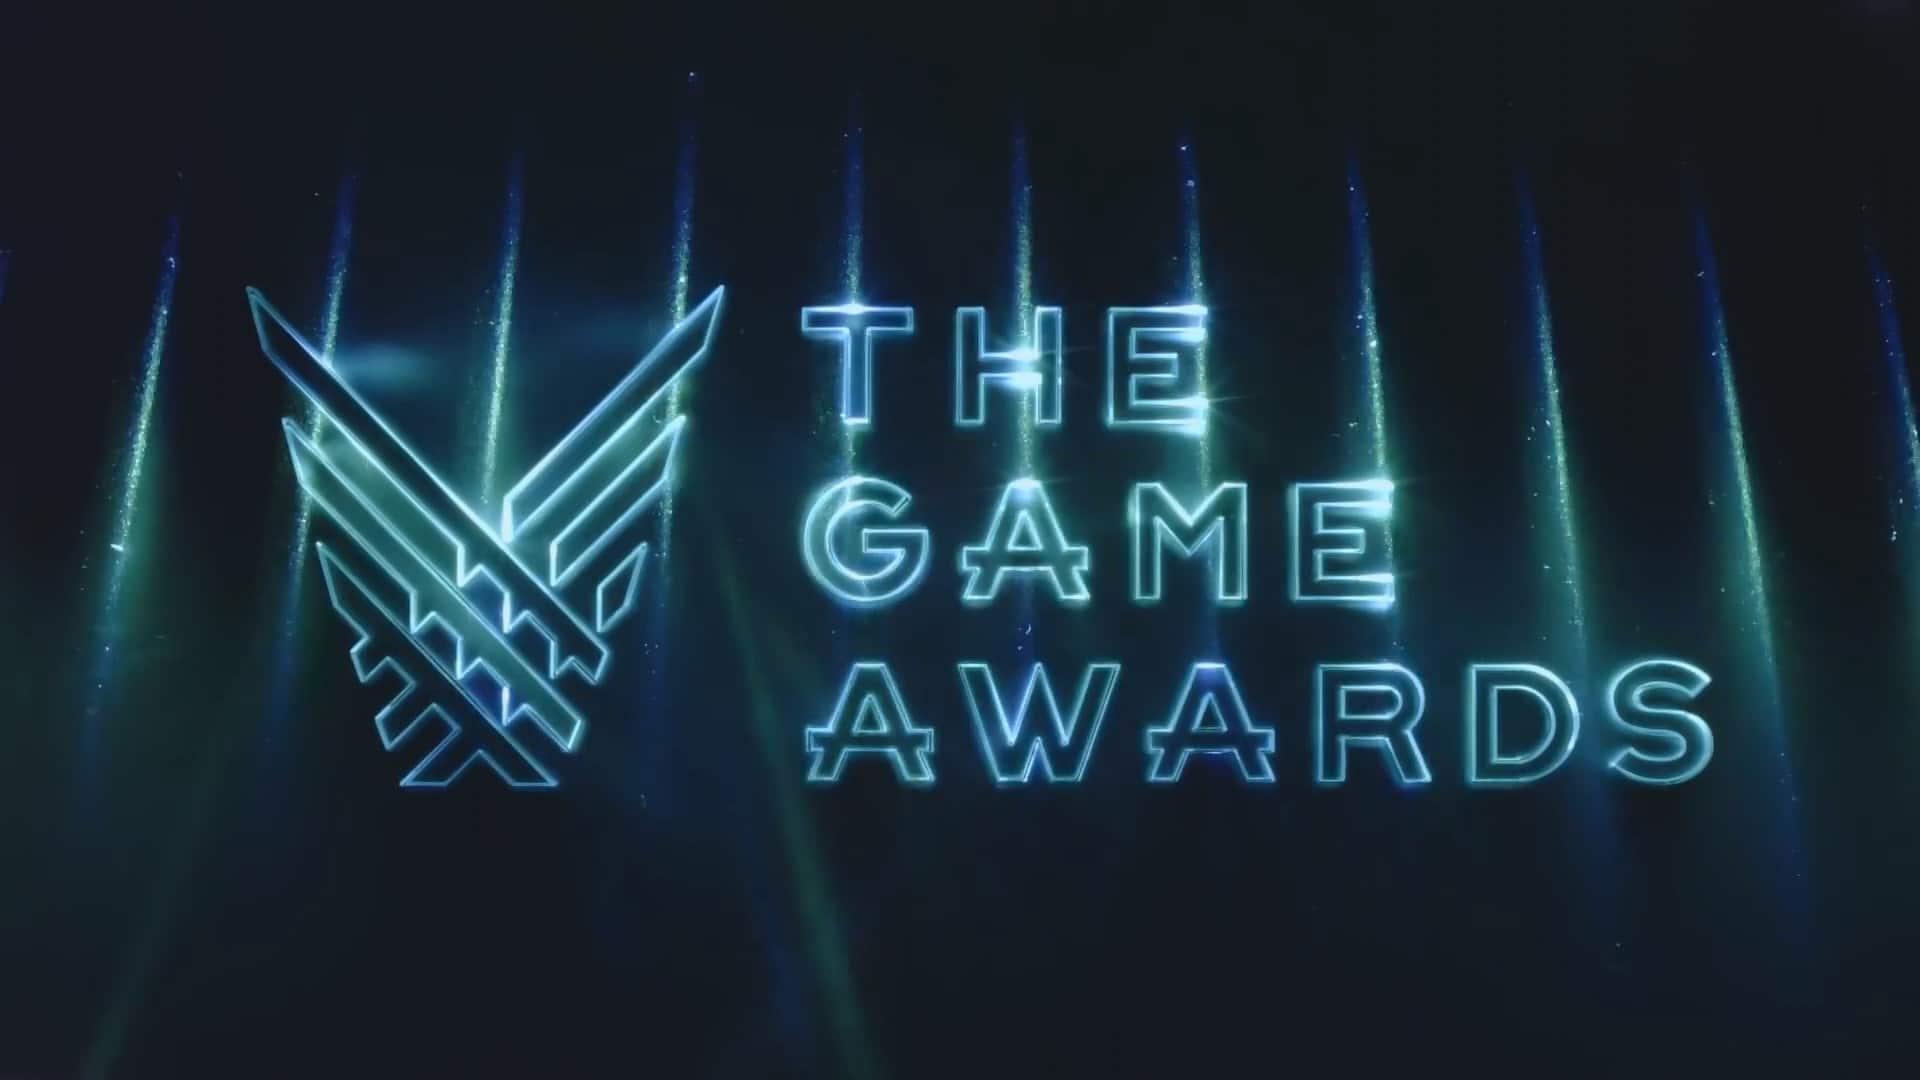 TGA2018公布各奖项提名 战神大镖客竞逐年度游戏